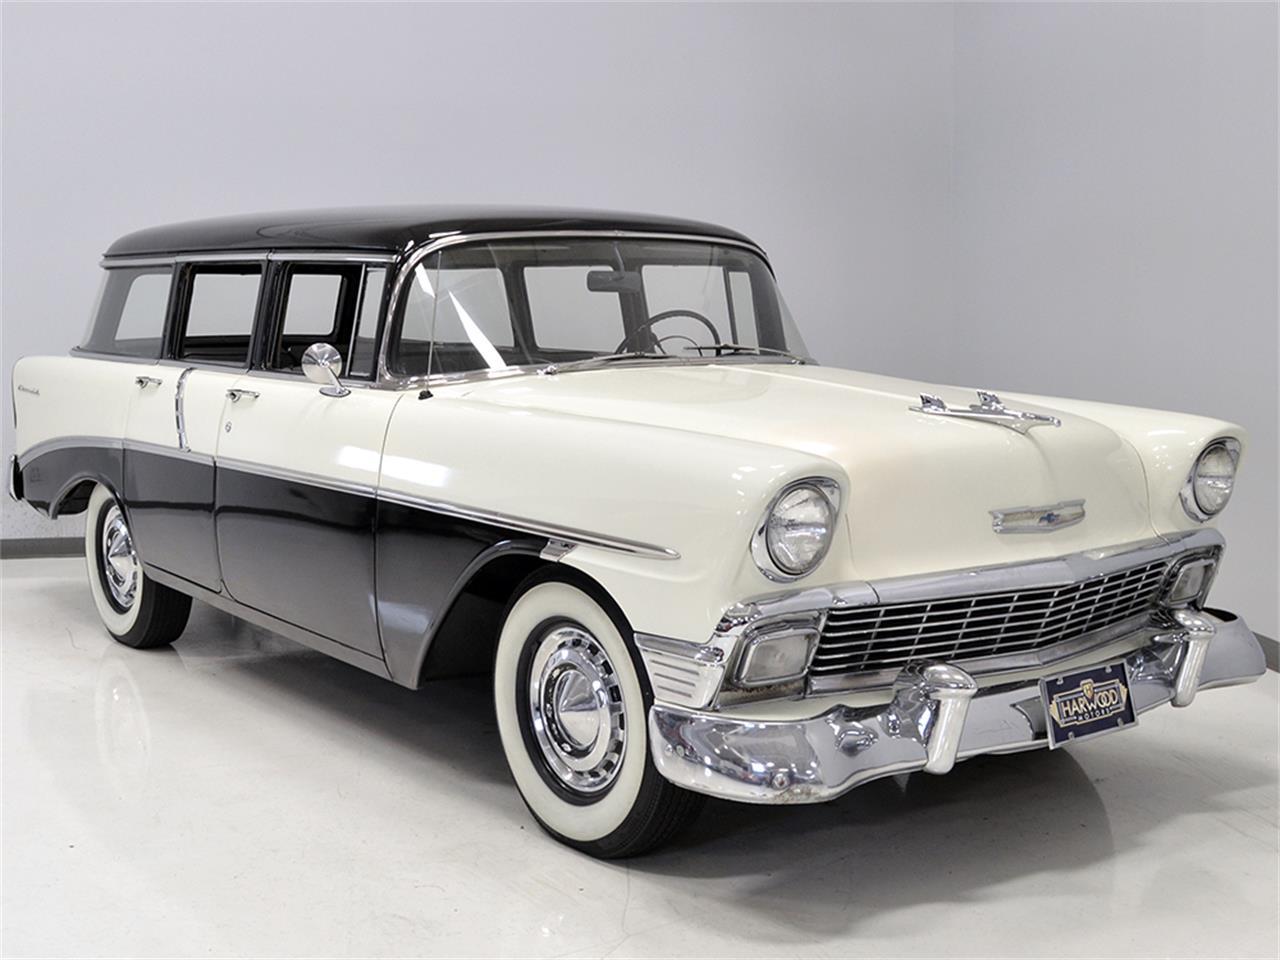 Large Picture of '56 Chevrolet 210 - $24,900.00 Offered by Harwood Motors, LTD. - K2KS